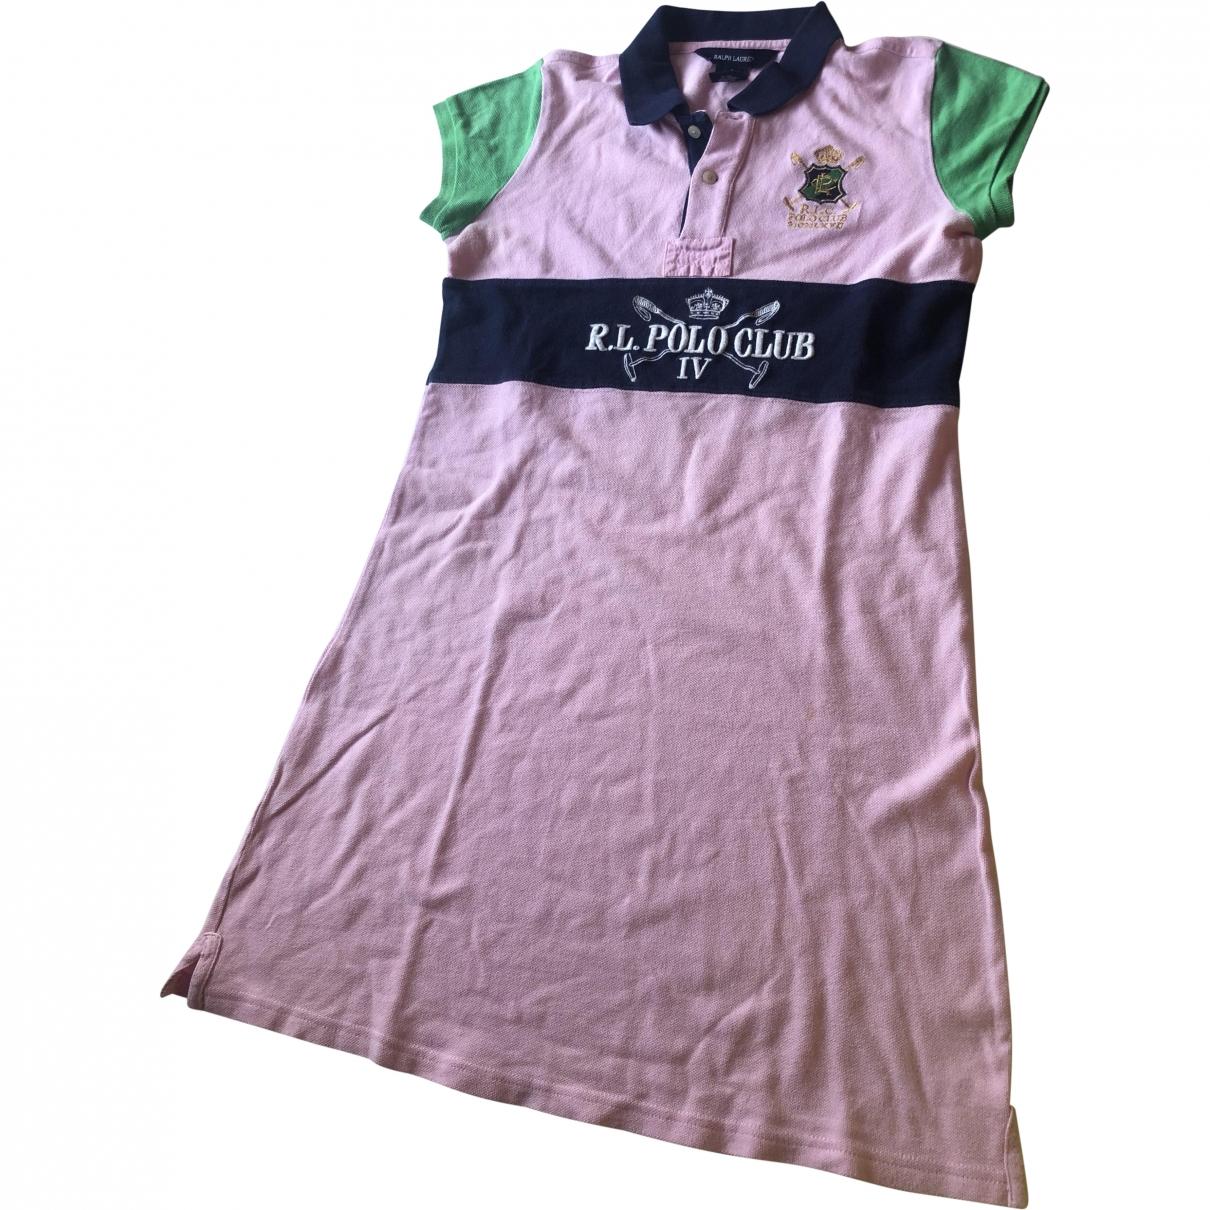 Ralph Lauren \N Pink Cotton dress for Kids 18 years - L FR